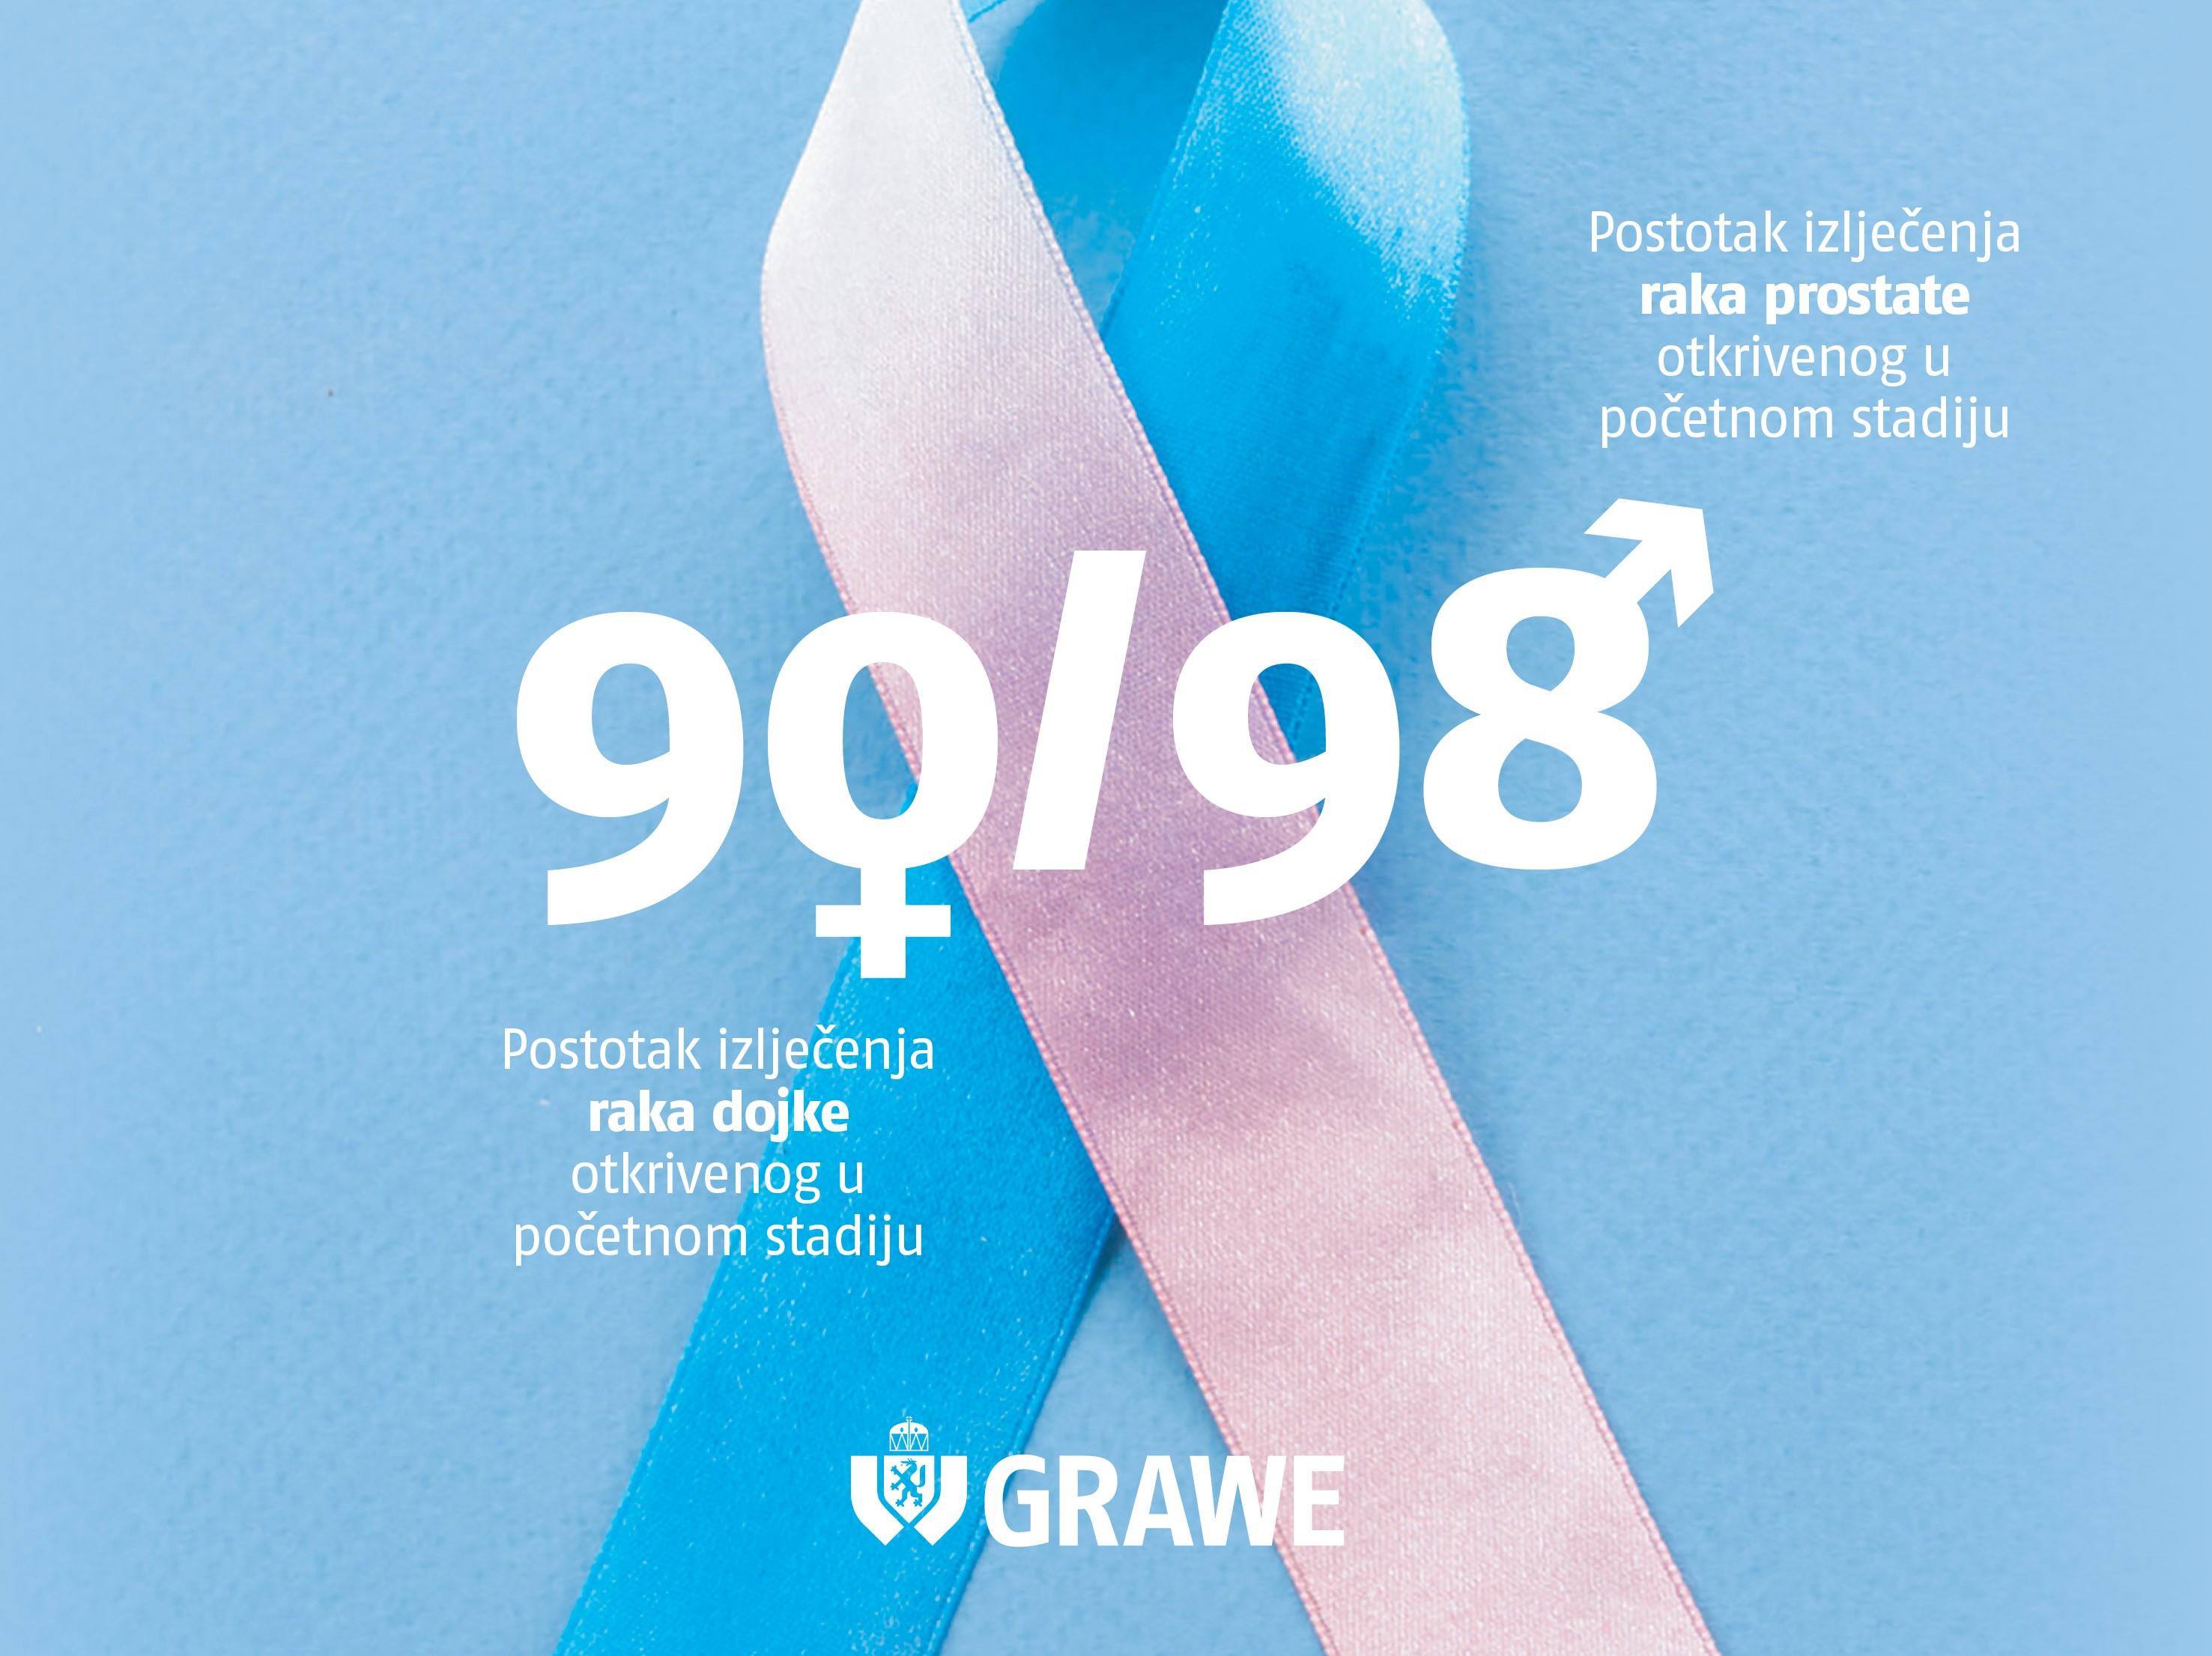 GRAWE kampanja 90/98